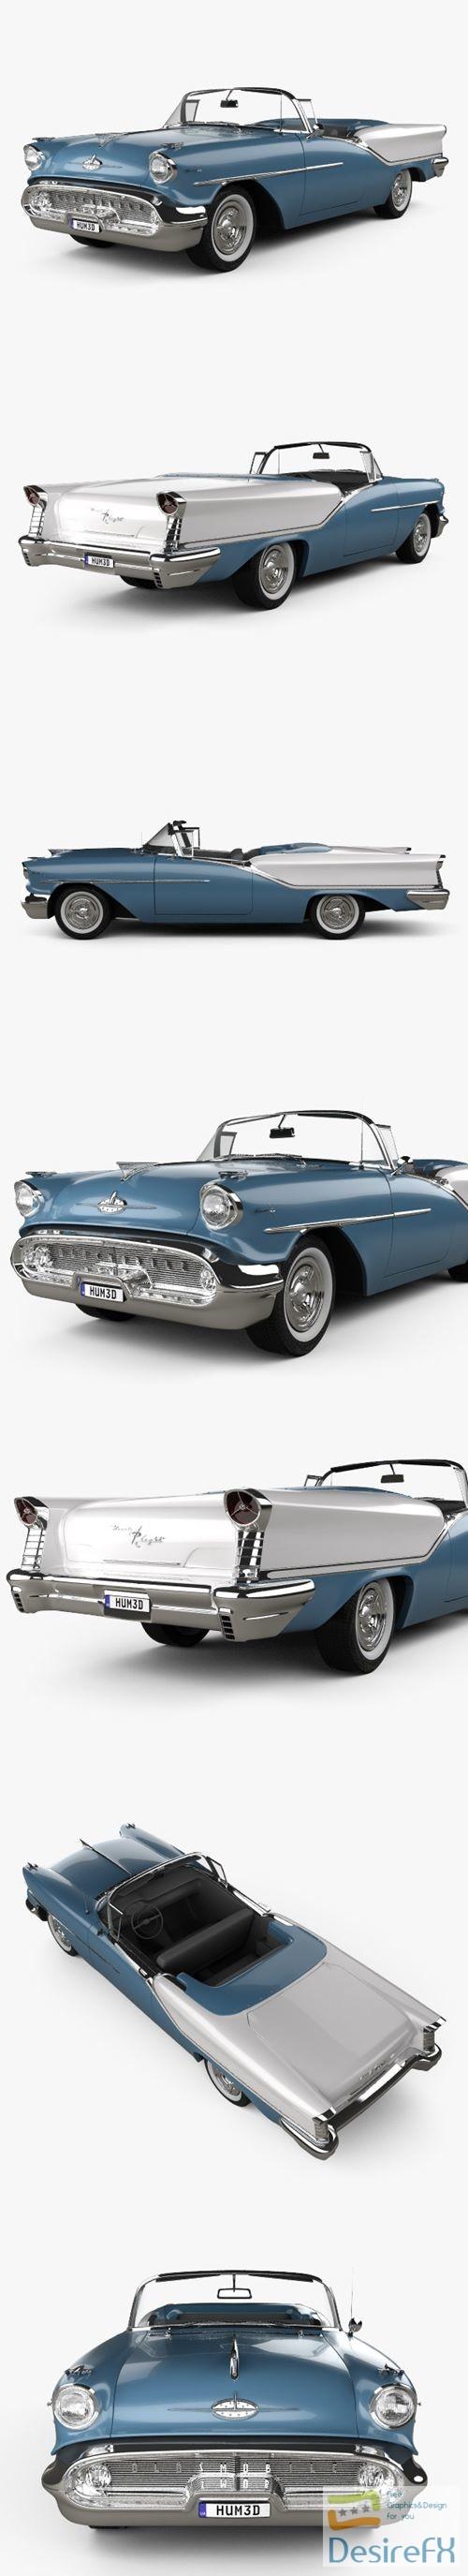 3d-models - Oldsmobile Starfire 98 Convertible 1957 3D Model